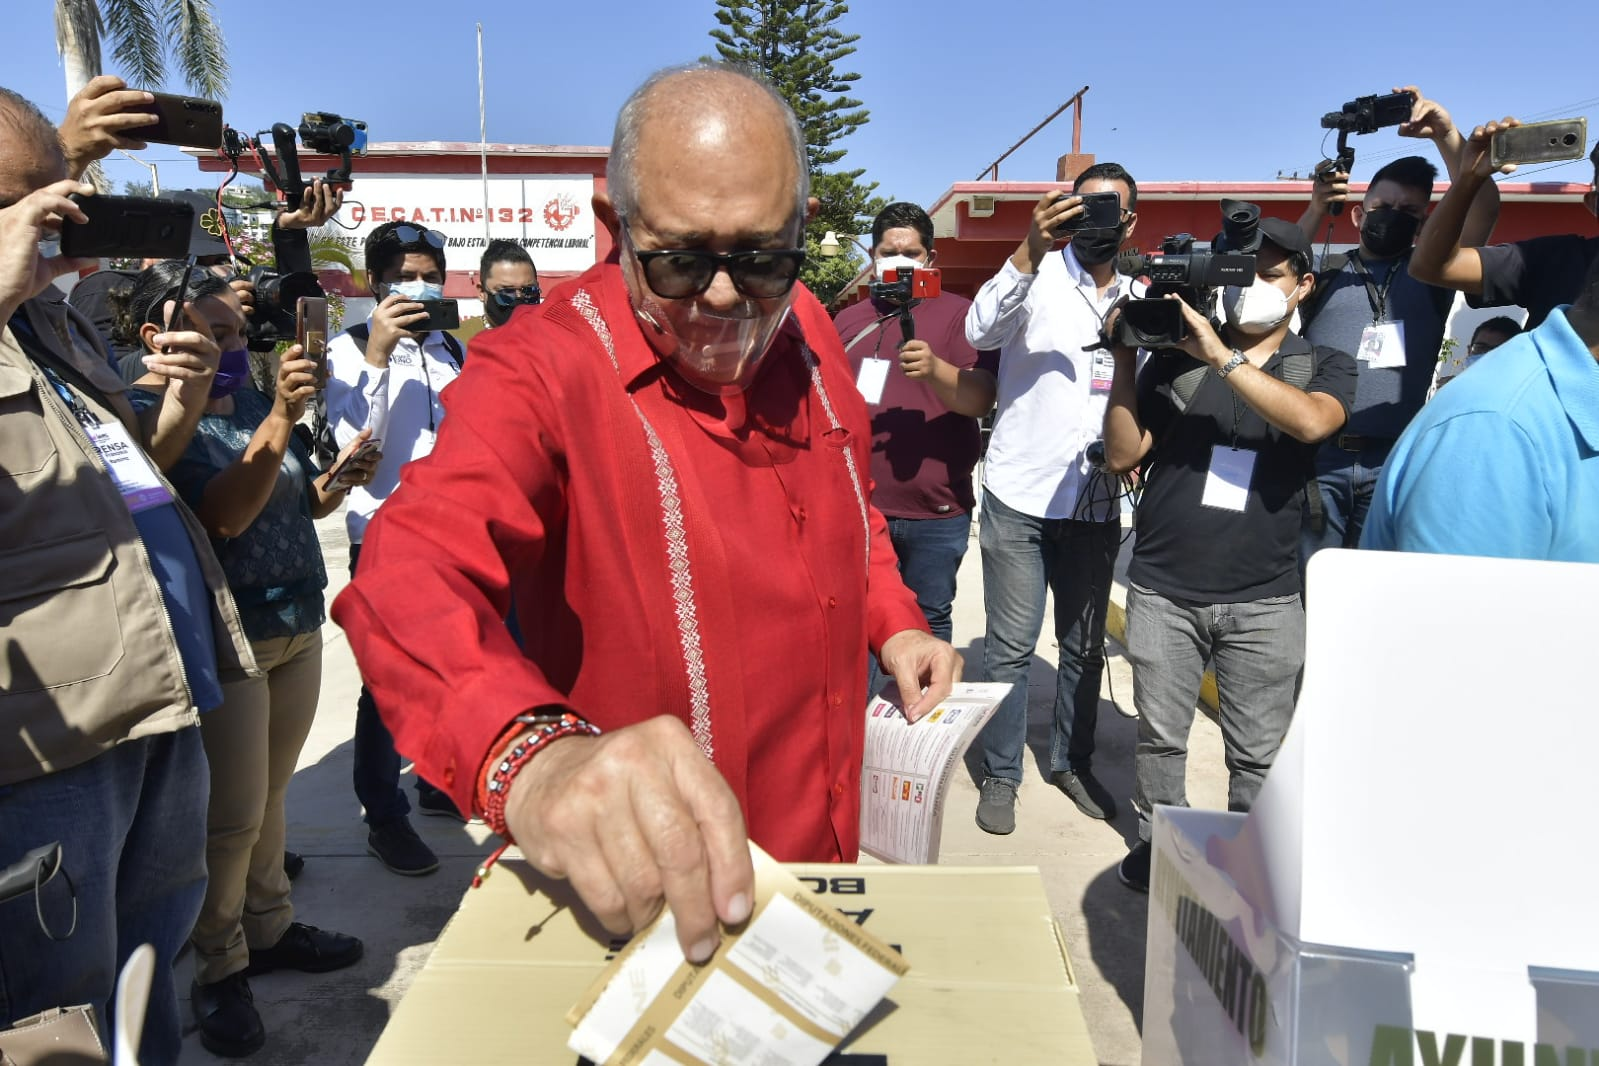 Luis Guillermo Benítez Torres se presenta a emitir su voto